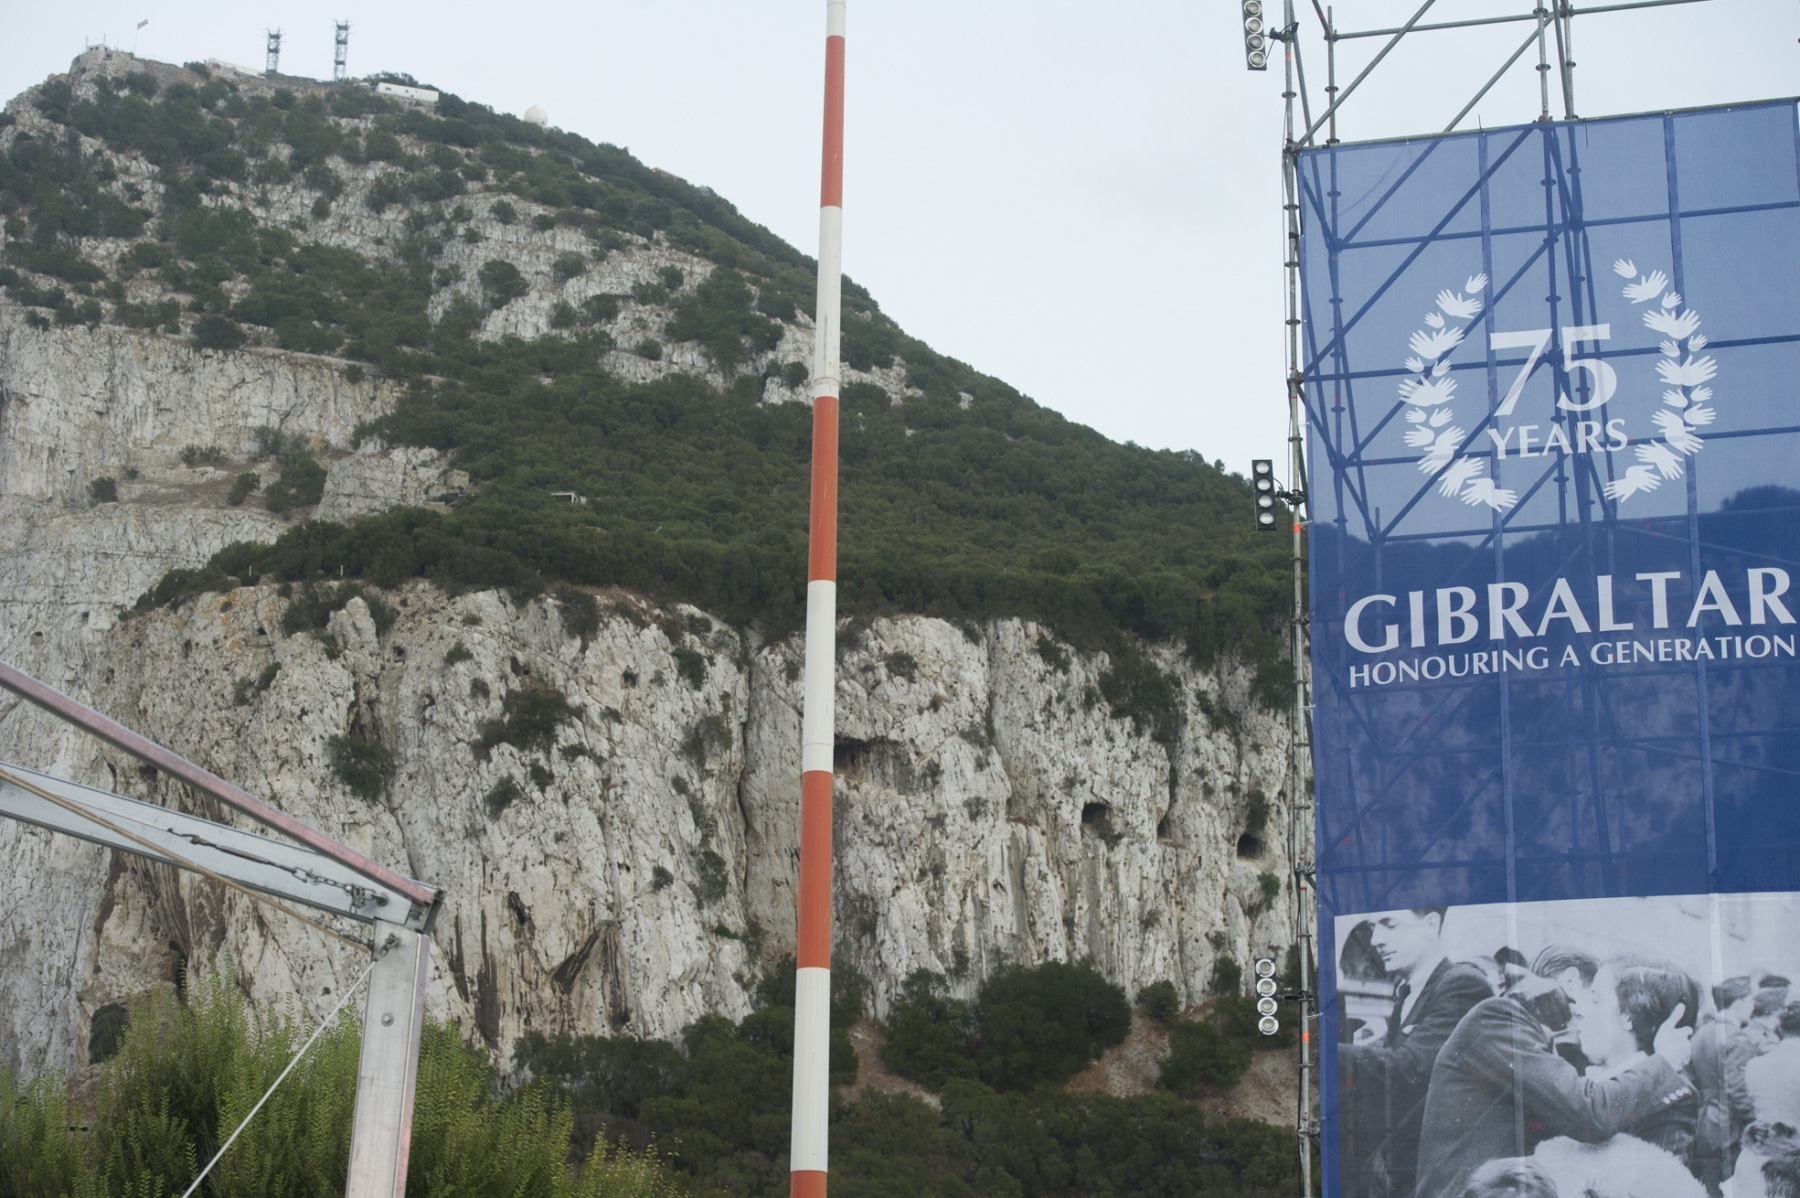 concierto-evacuados-de-gibraltar-07092015-55bn_21246908561_o